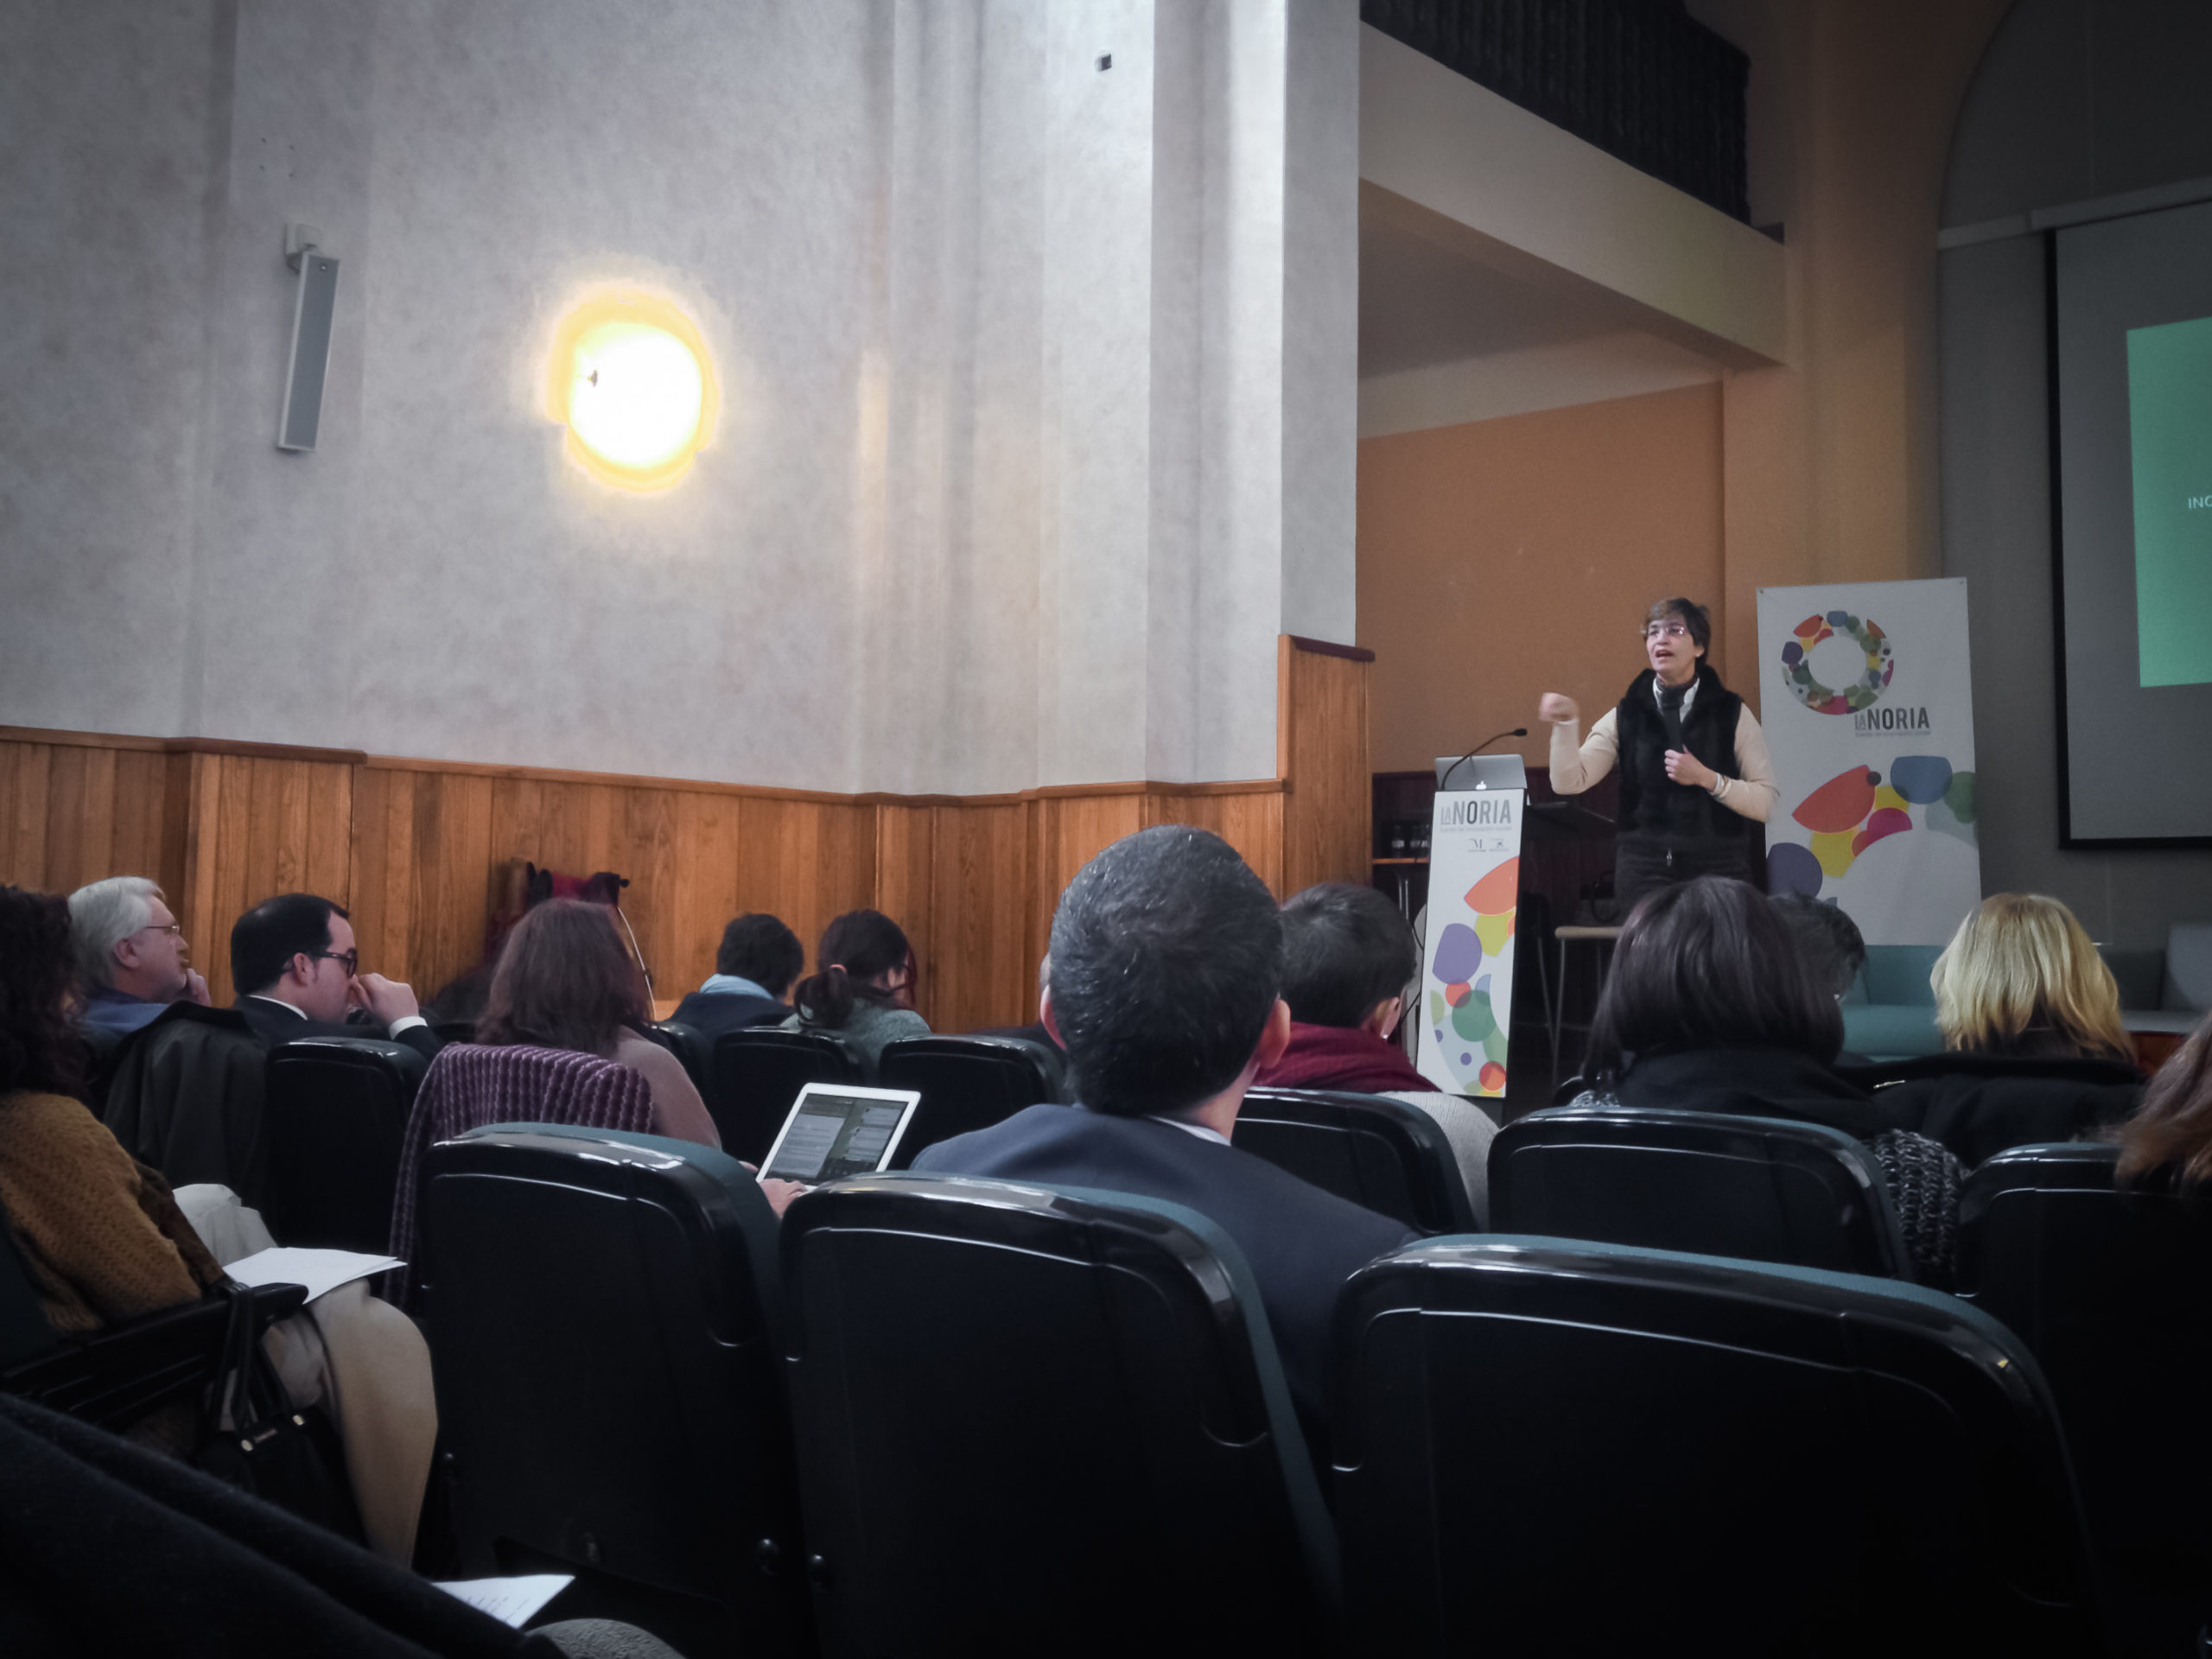 Maria Do Carmo, head of the Consortium - Initiative for the Civic Economy Portugal.